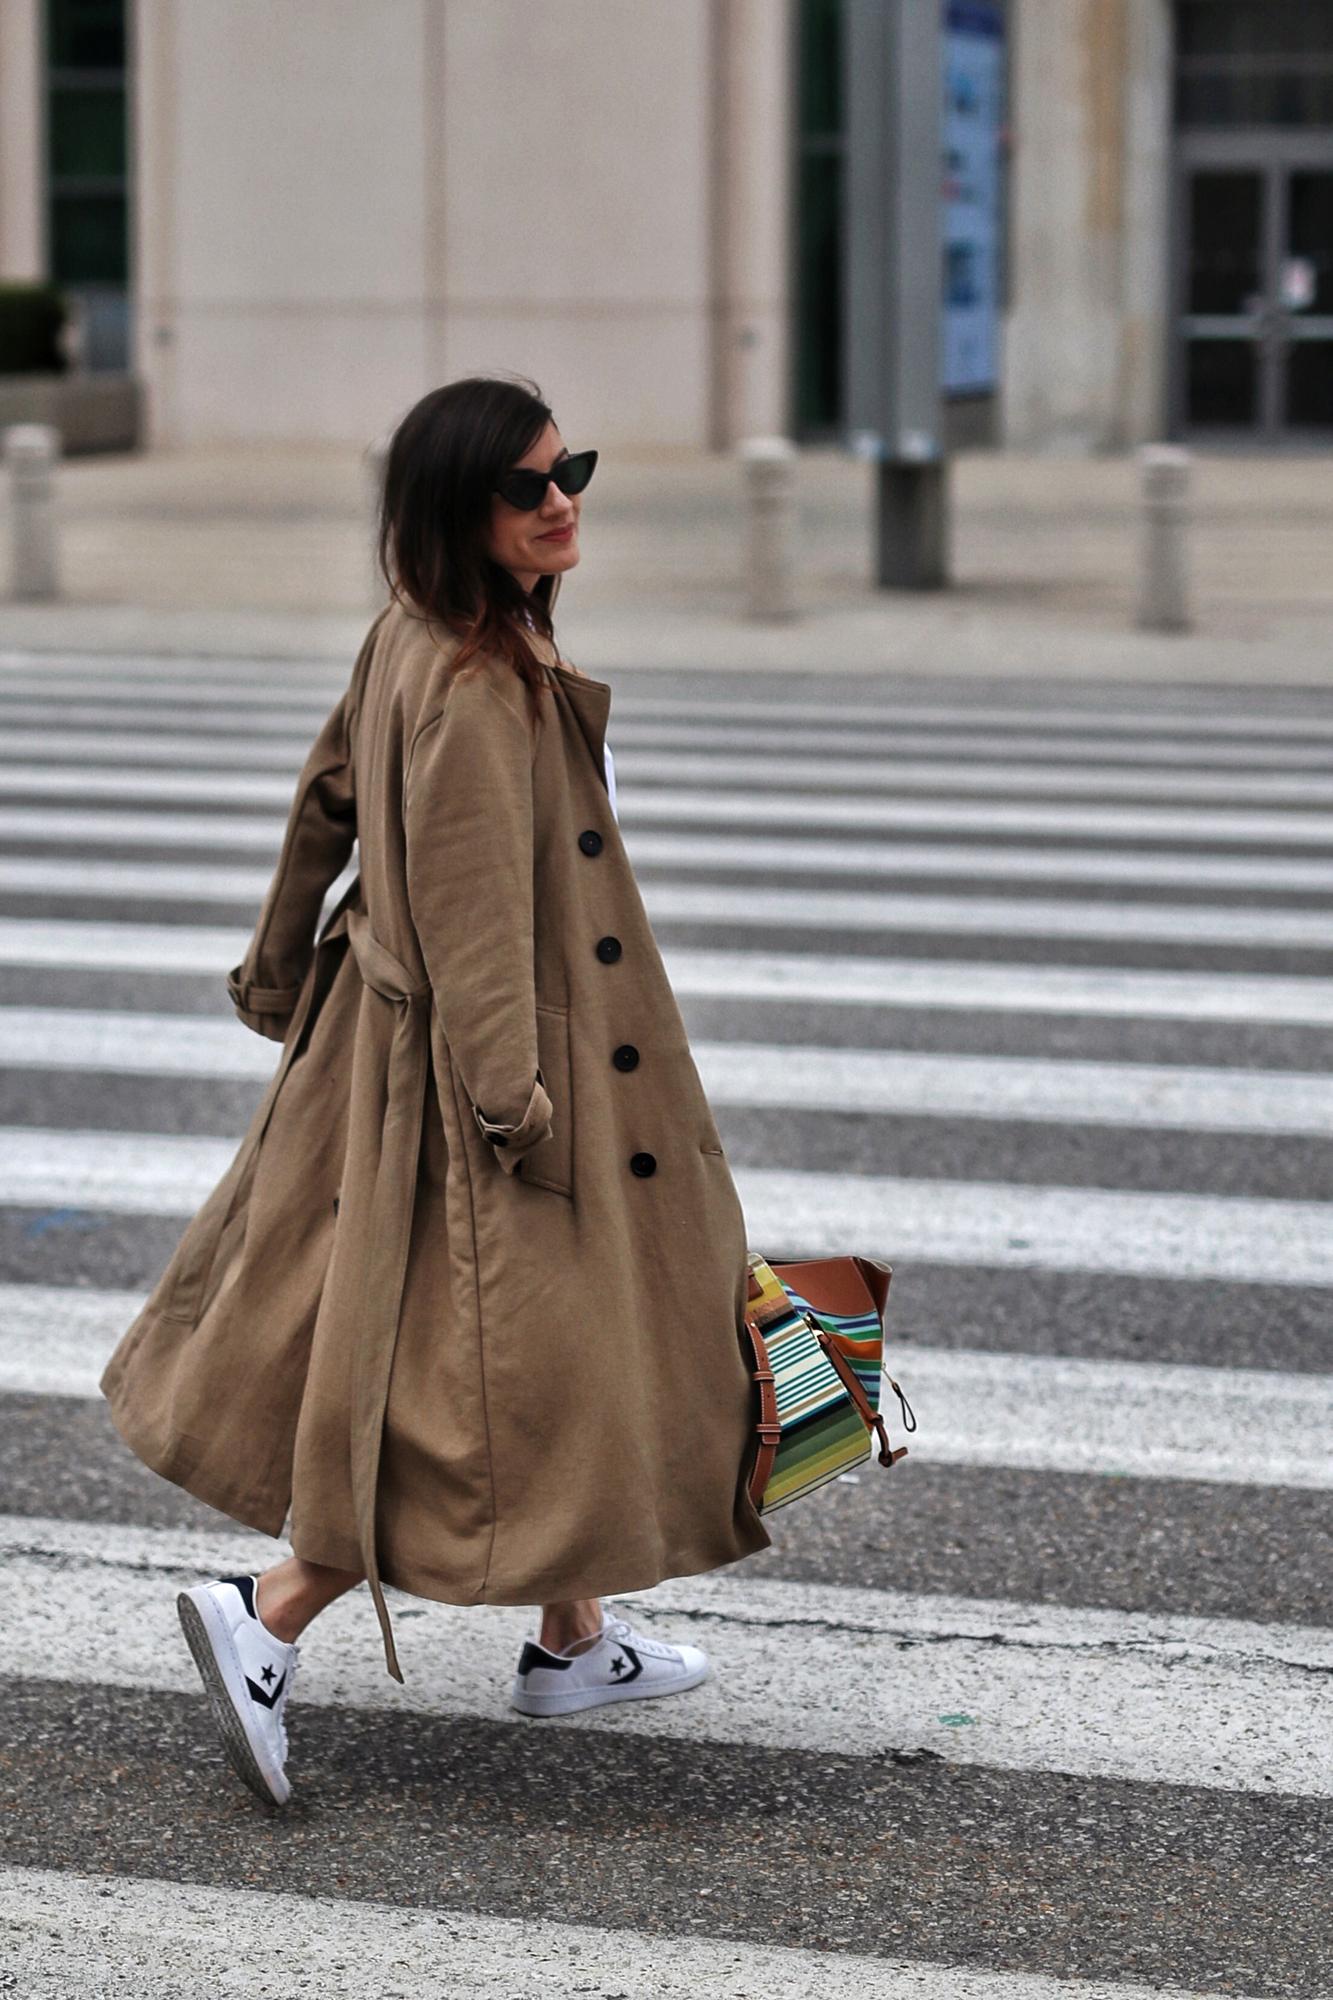 woahstyle.com 2018 - zara linen trench coat, free people cut off shorts, converse one stars, loewe striped small hammock bag, white button up shirt - toronto street style - hotel x - nathalie martin 7.jpg